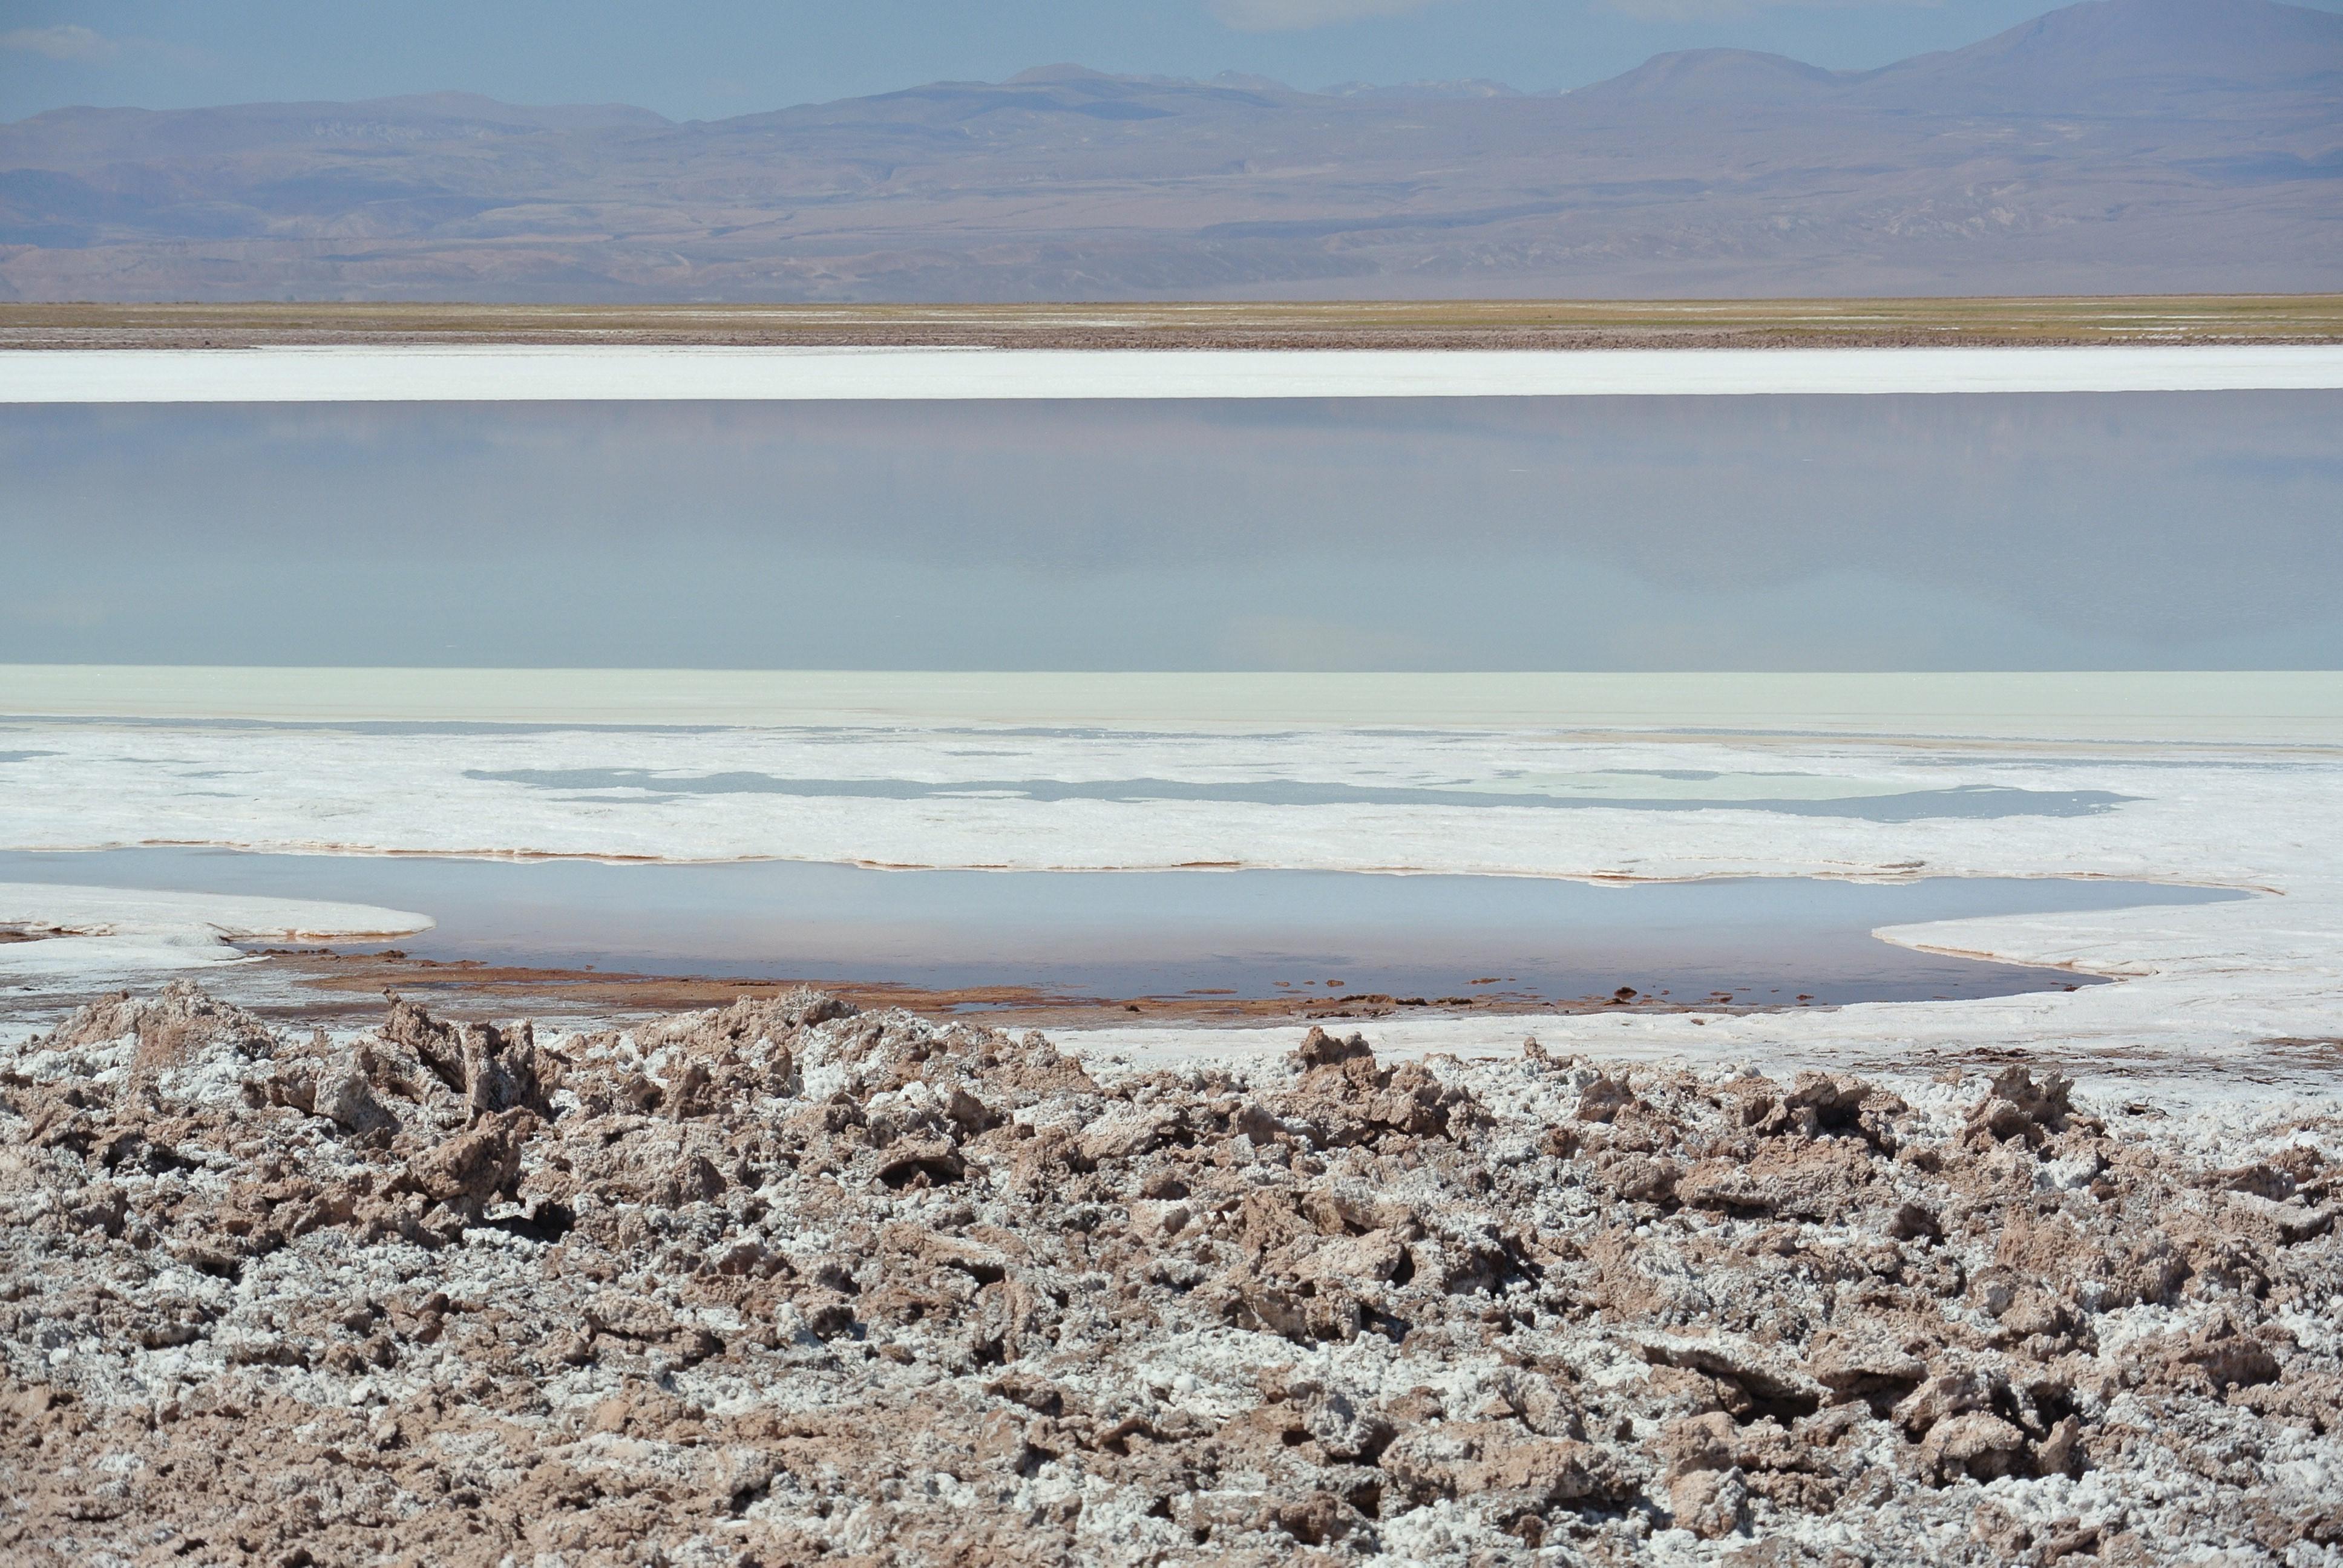 025 0912 Mirador - Salar de Atacama 147jpeg